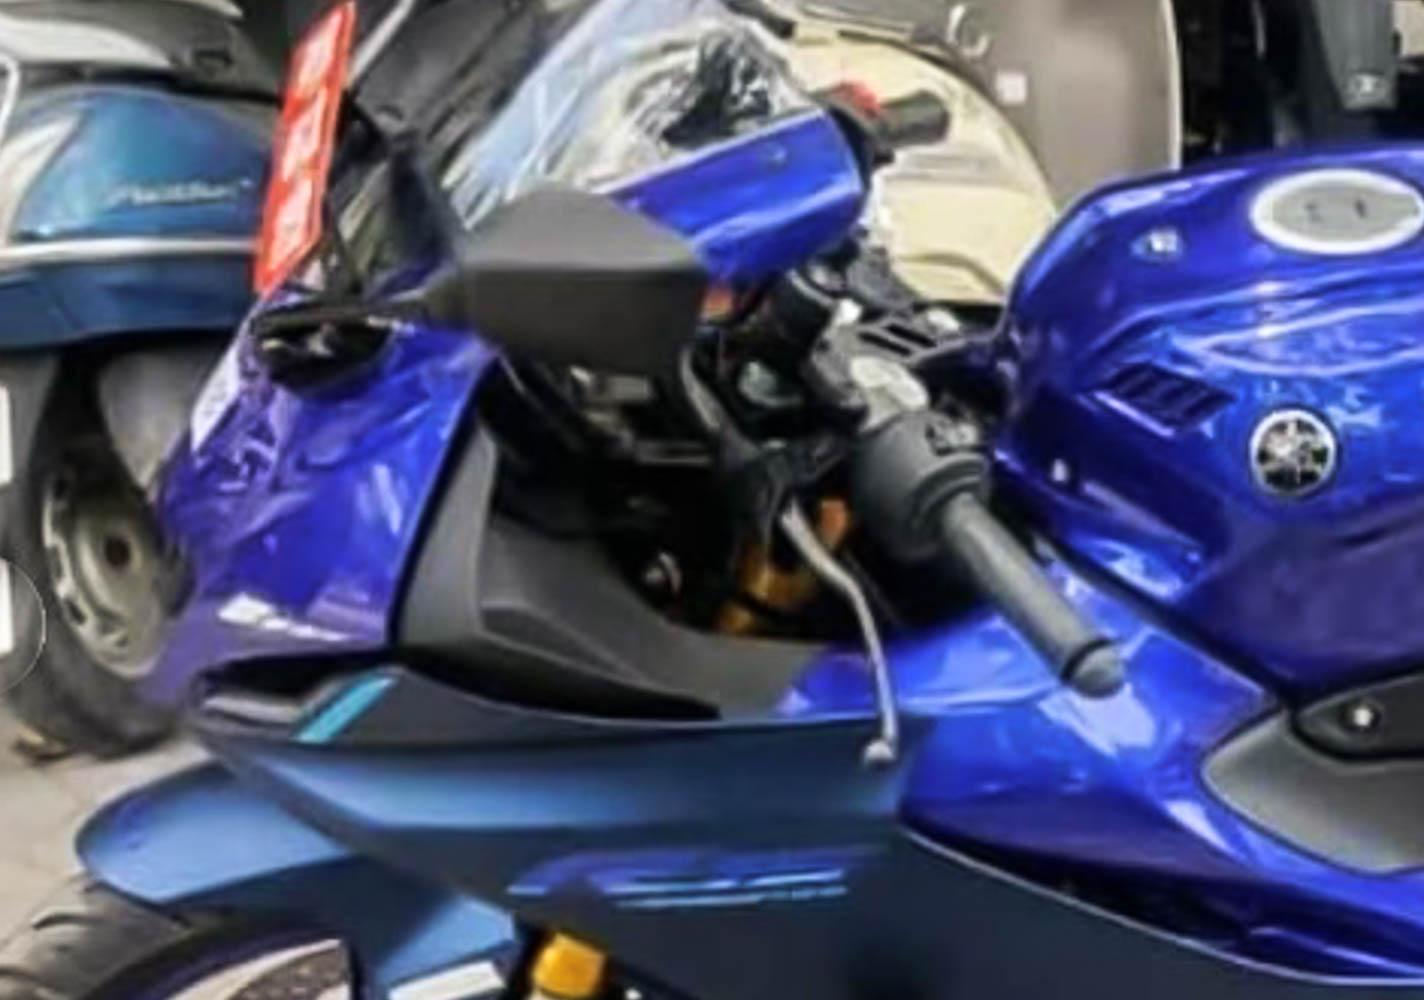 Cek Harga dan Spesifikasi Motor Terbaru Yamaha, Dibandrol